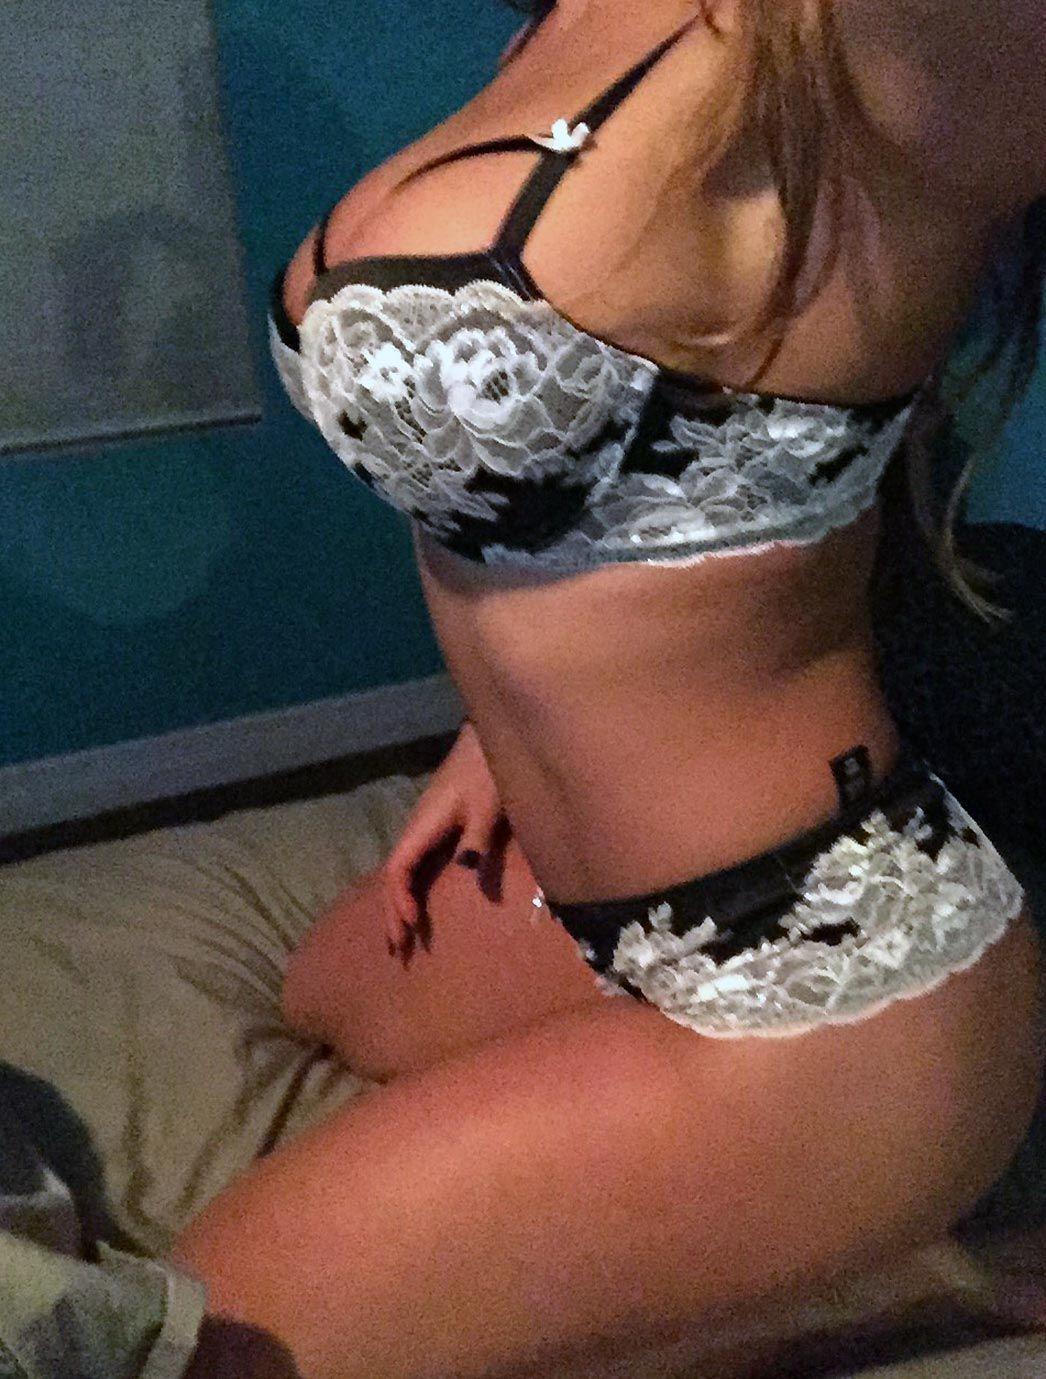 Celeste Bonin Nude Leaked The Fappening & Sexy 0253